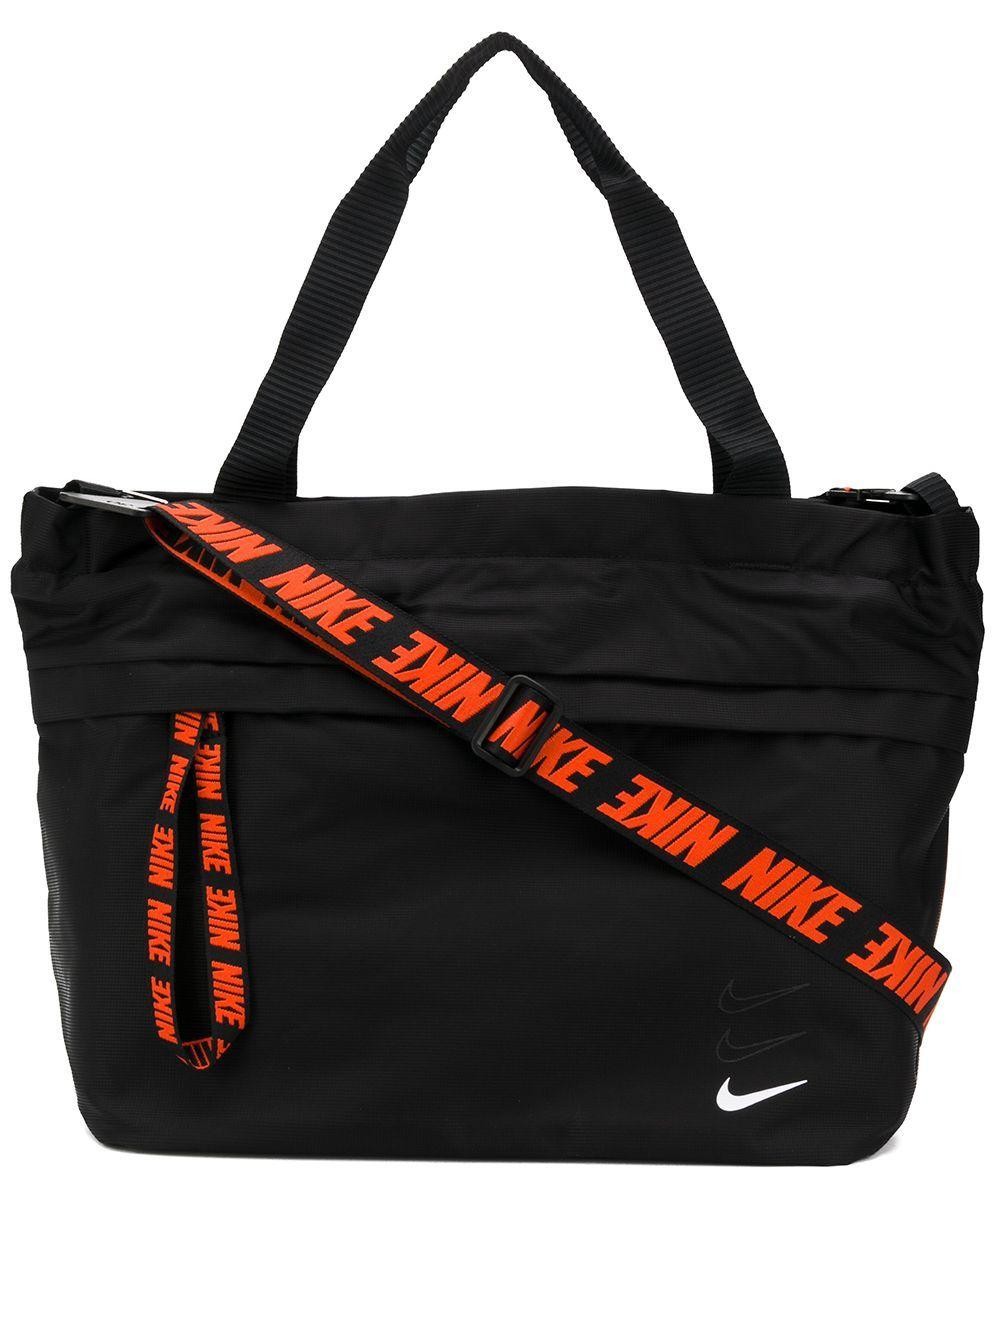 Nike Sportswear Essentials Tote Bag Farfetch in 2020